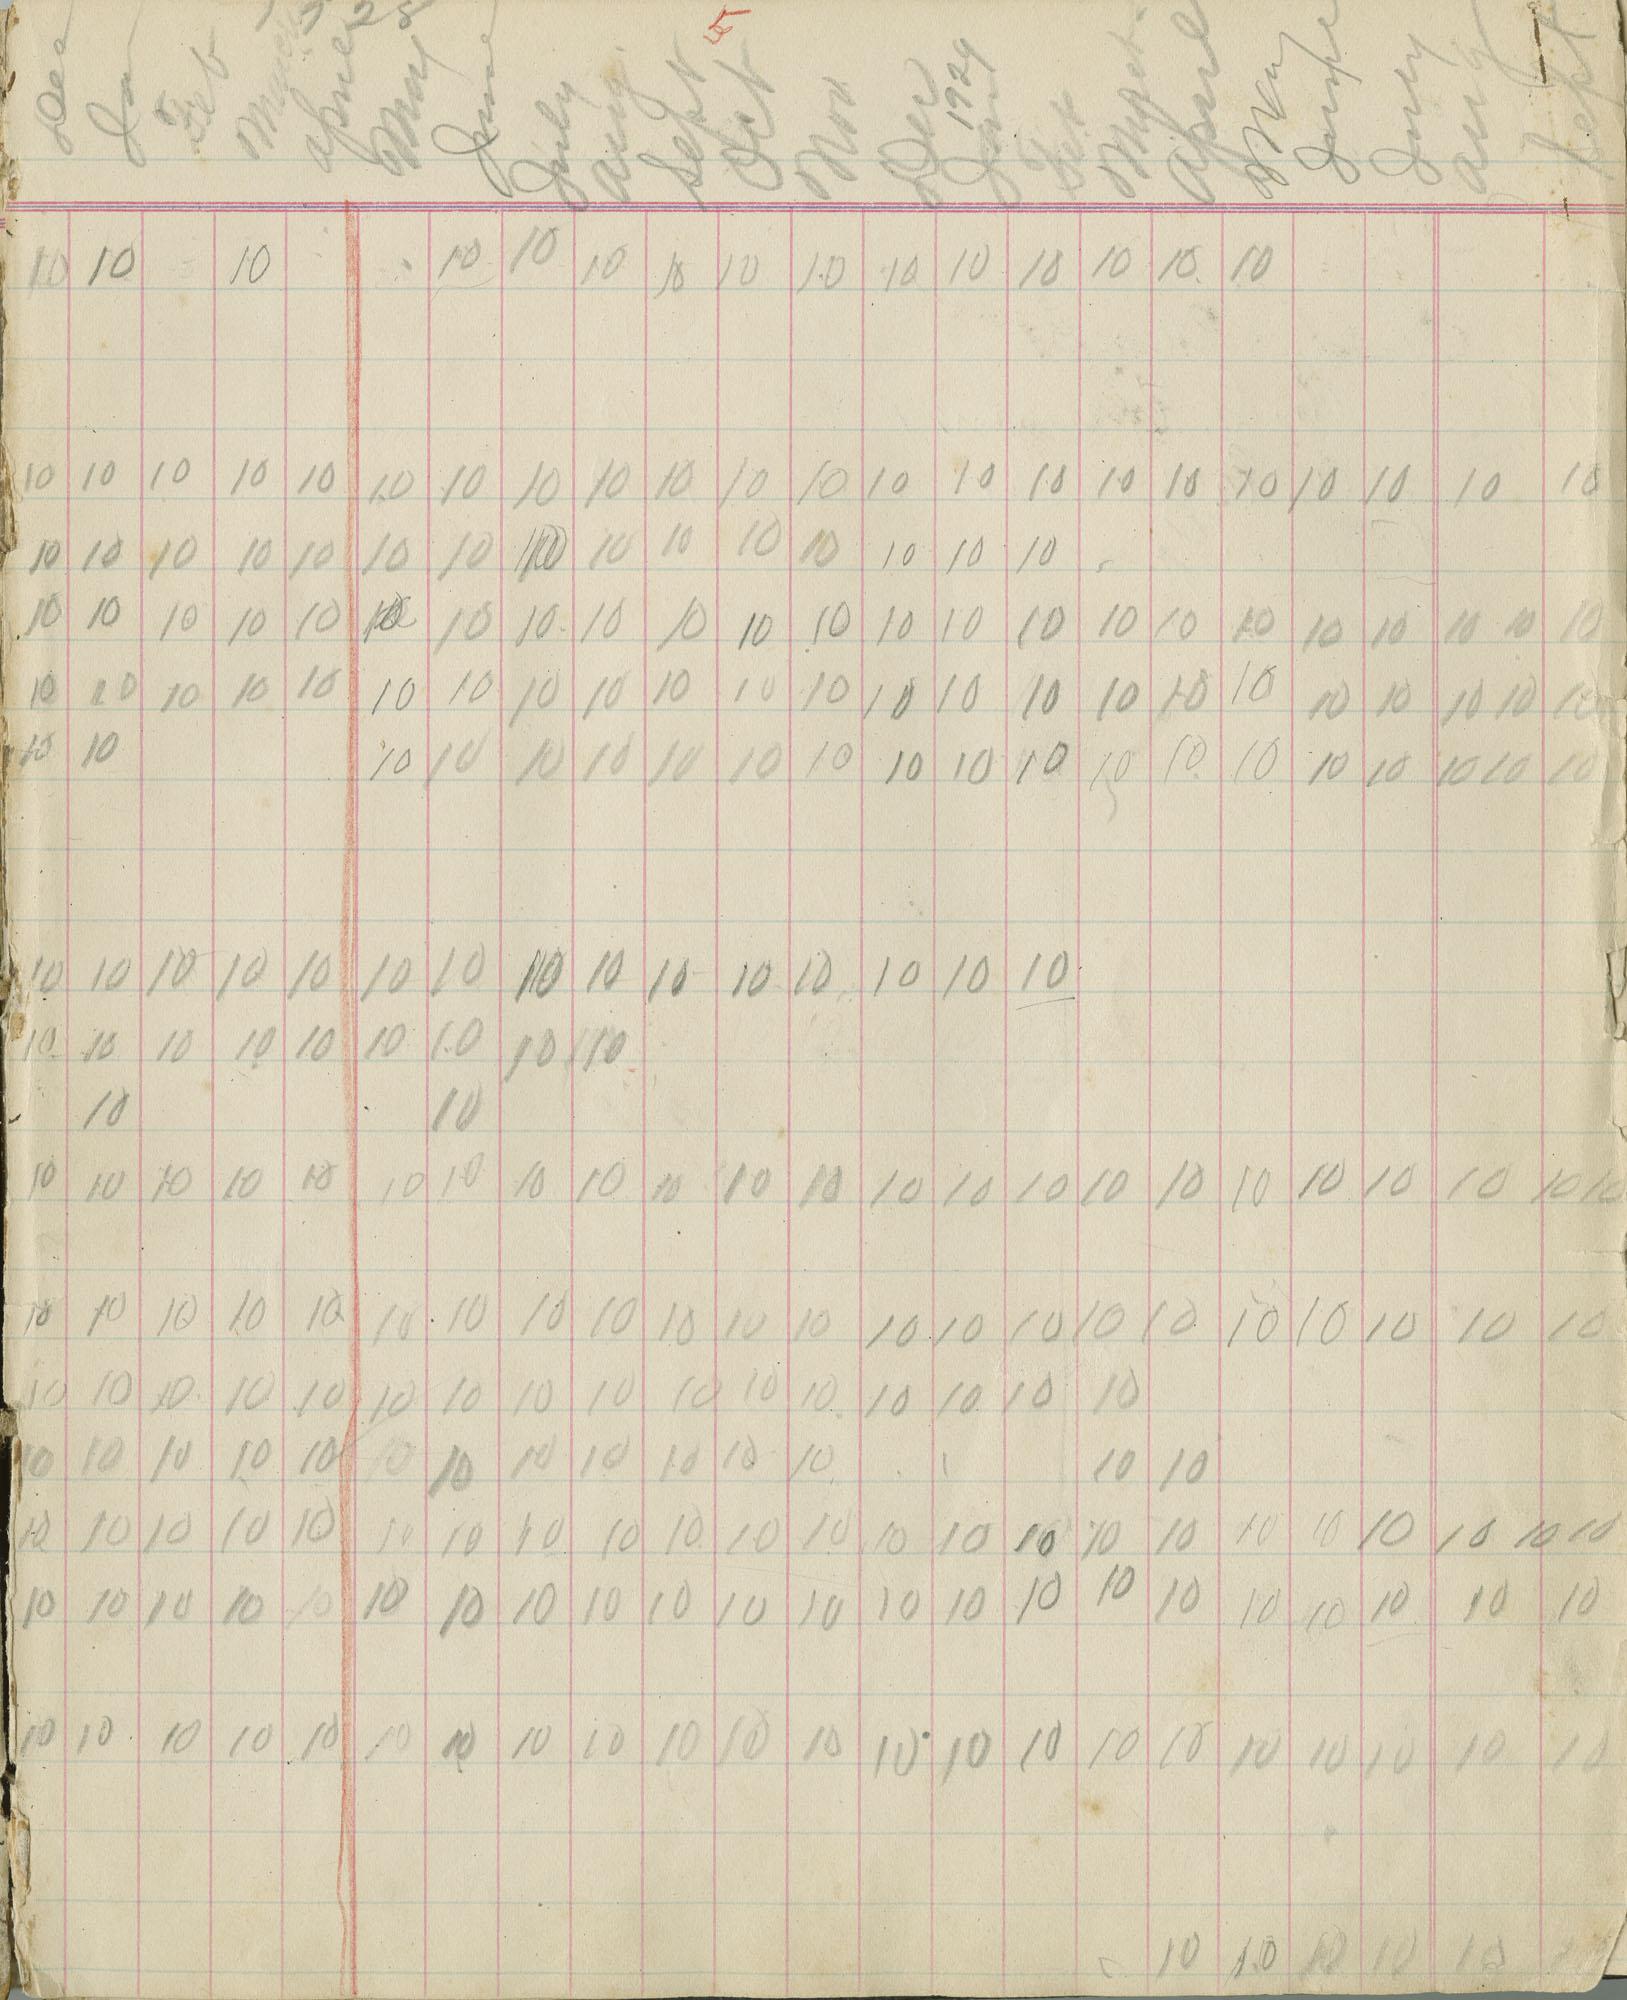 19. Page Seventeen, Arrear Book, December 1927-September 1929